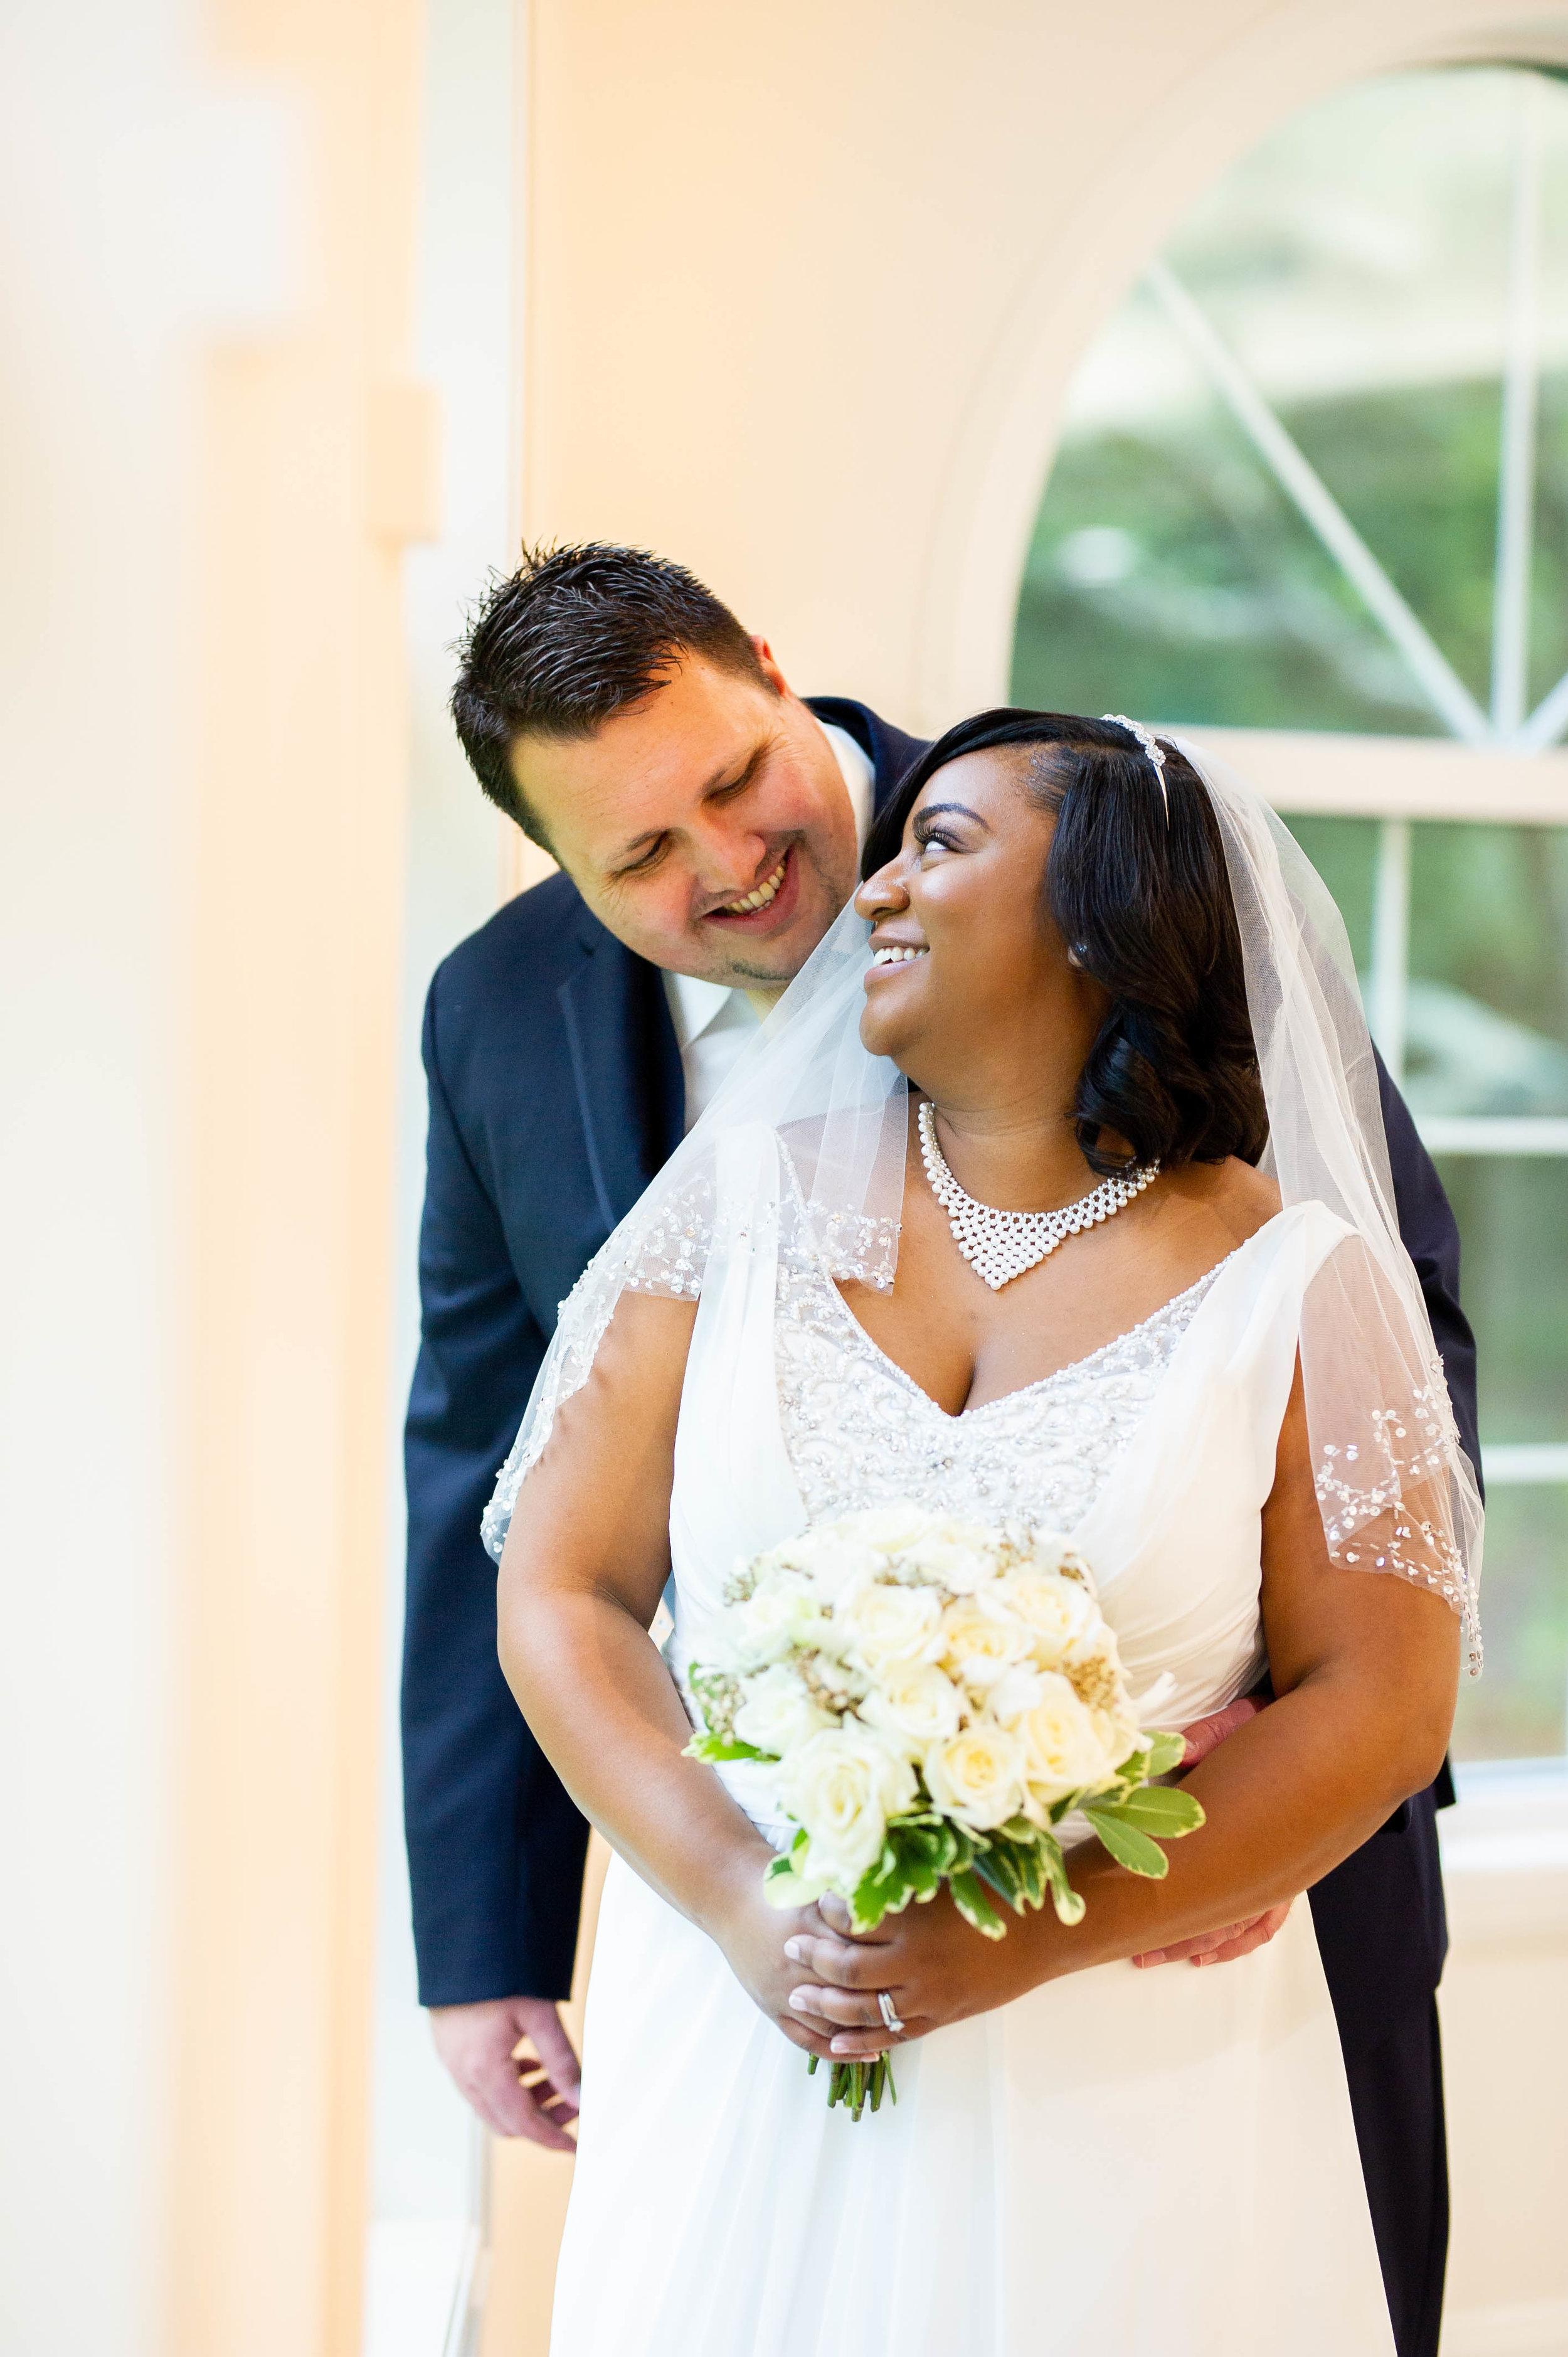 McNeile_Photography_Wedding_Tampa43.jpg